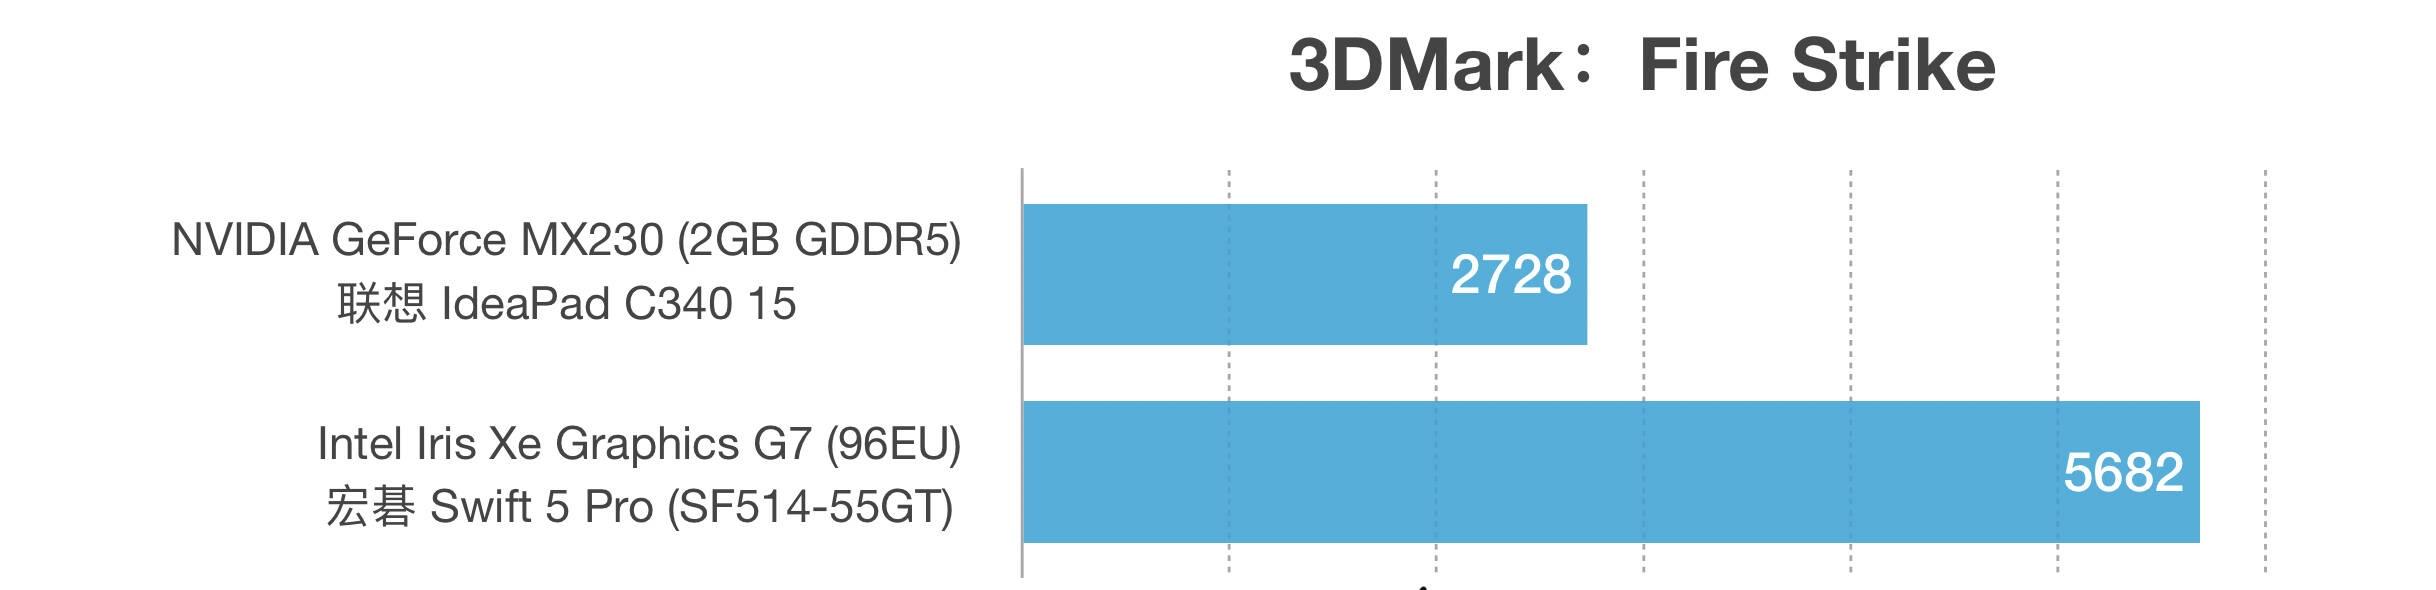 Intel Iris Xe Graphics G7和MX230性能跑分对比评测